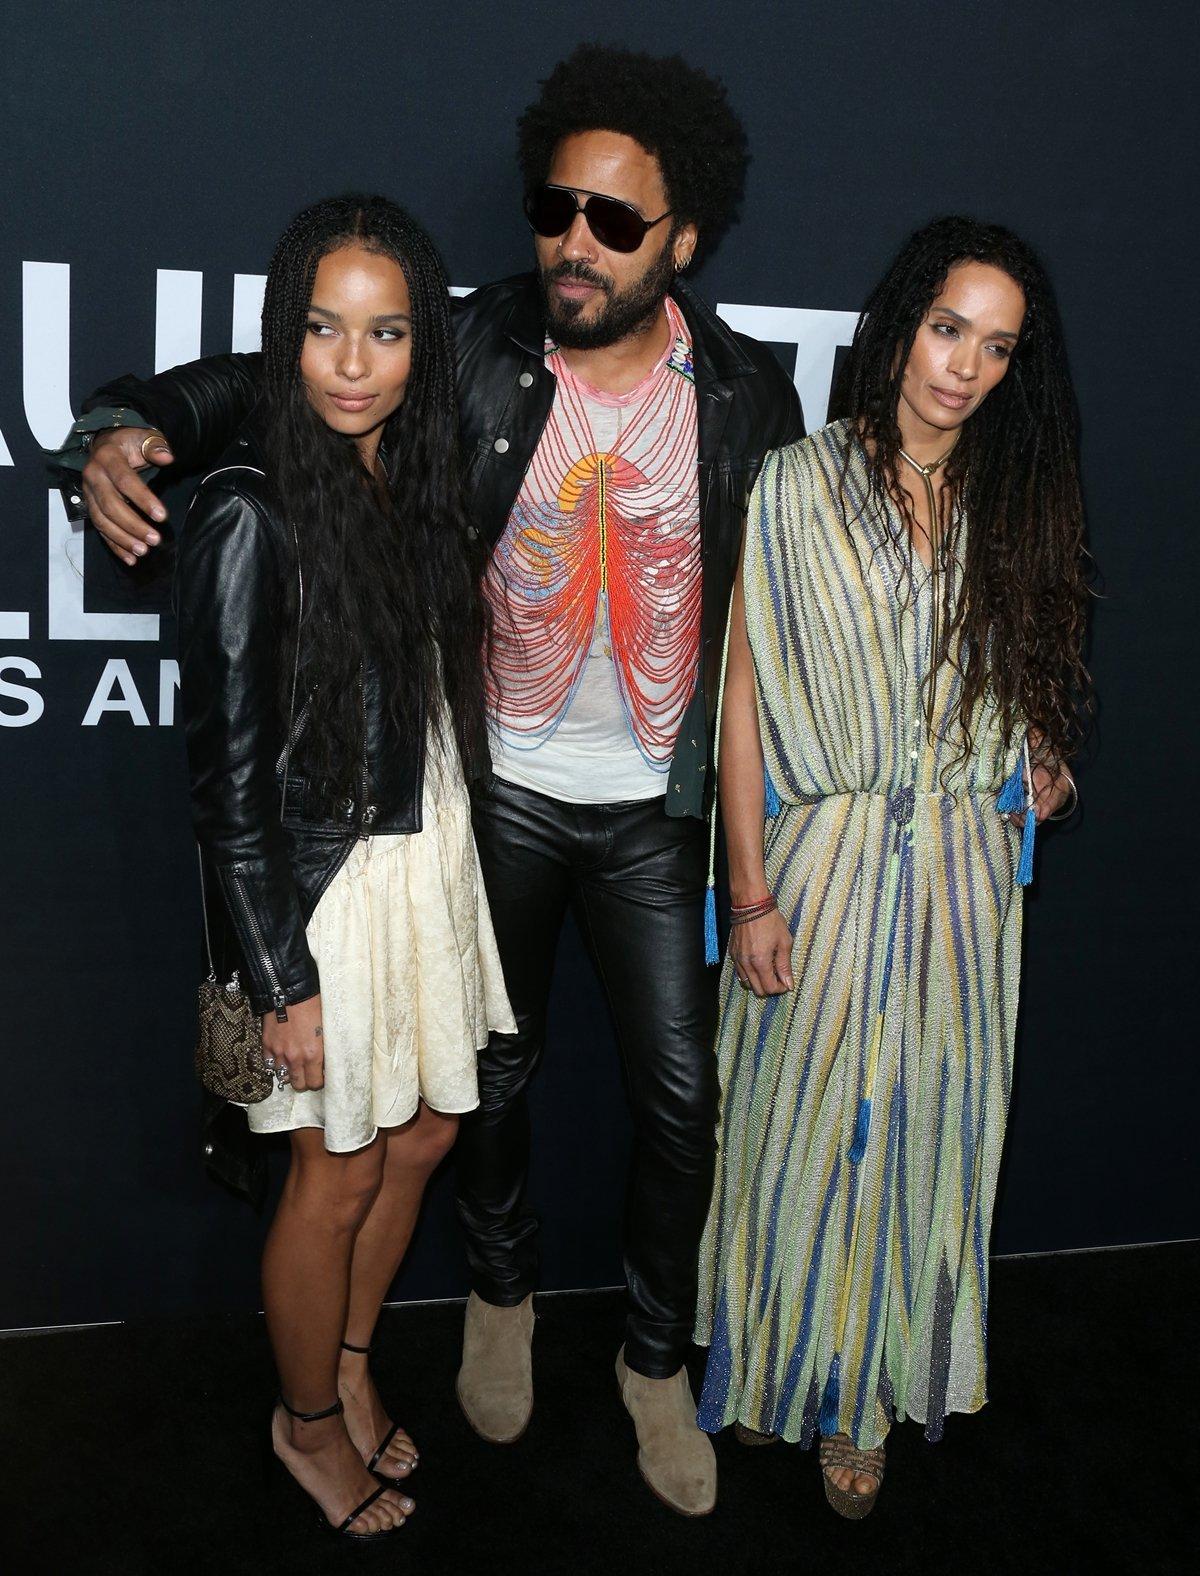 Zoë Isabella Kravitz is the daughter of actor-musician Lenny Kravitz and actress Lisa Bonet